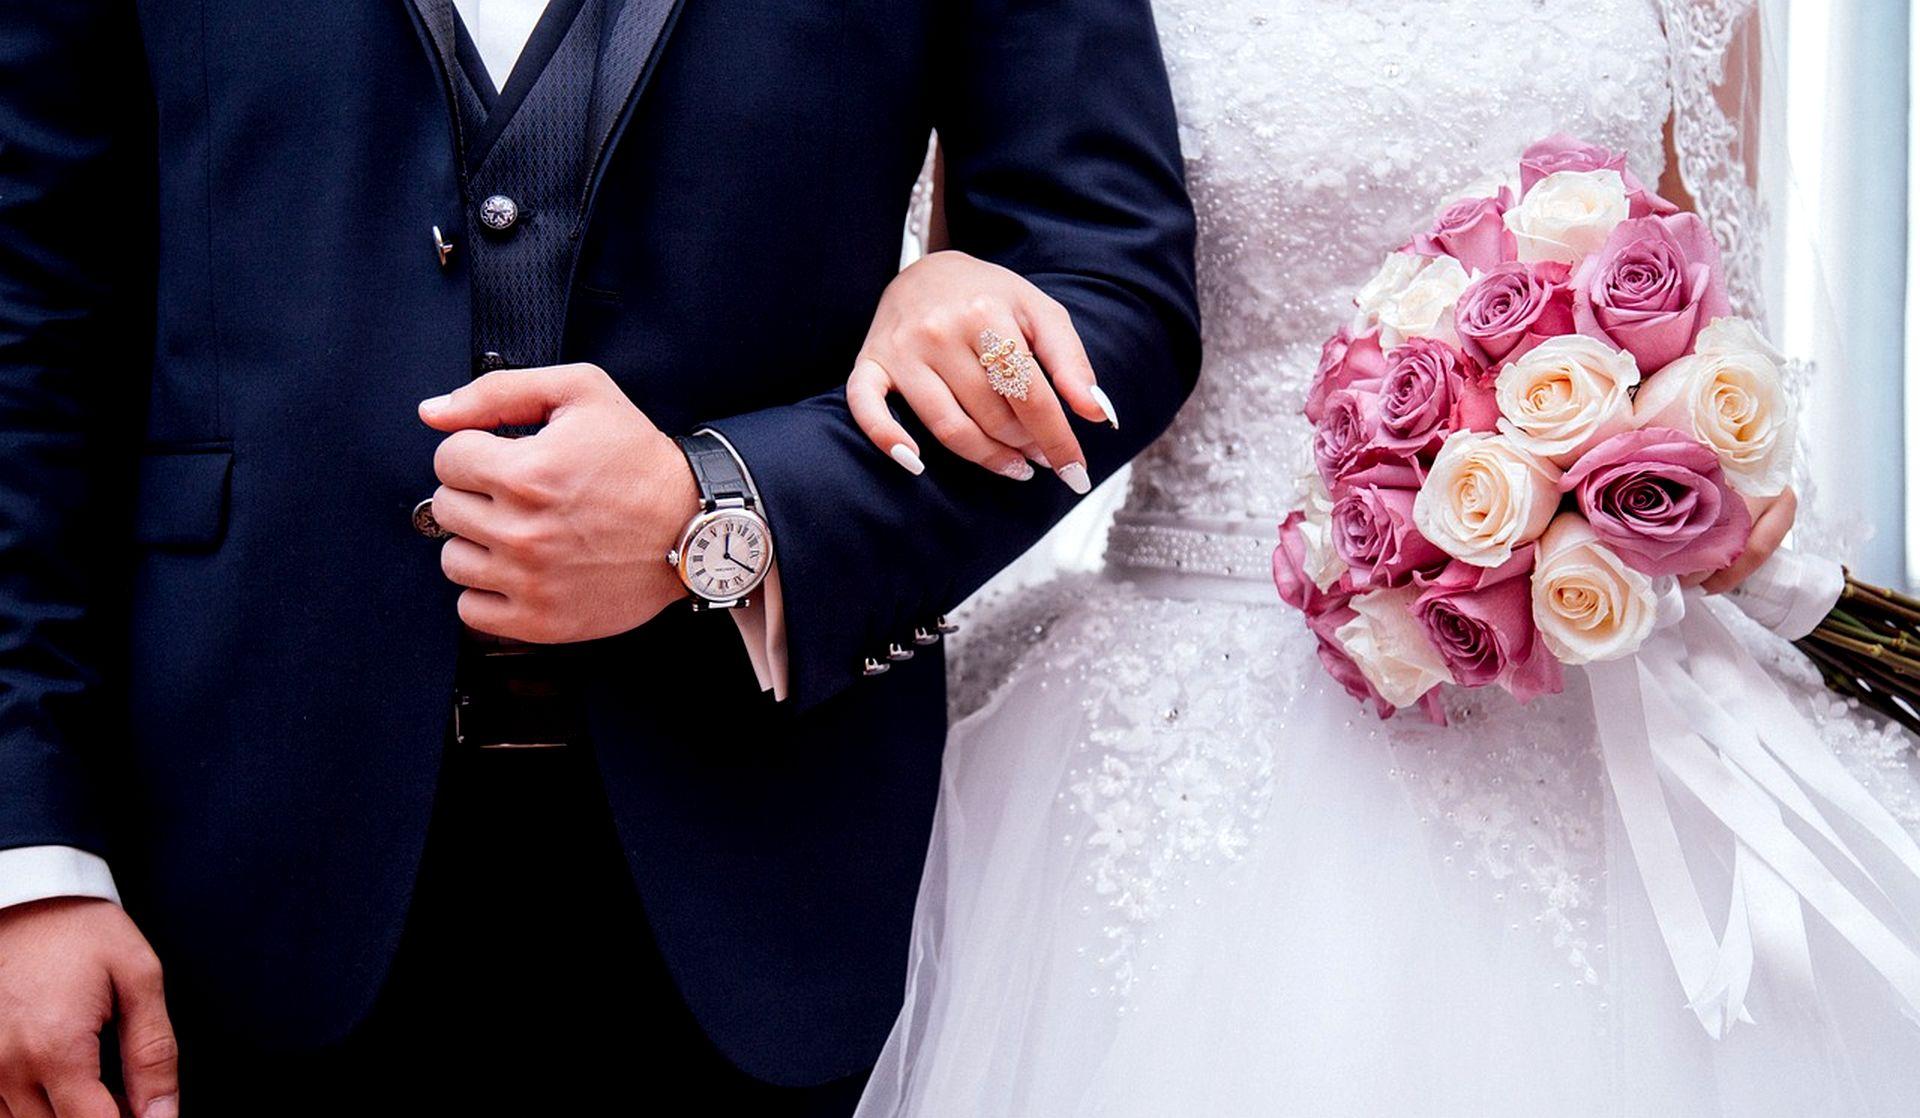 znak zodiaku a małżeństwo